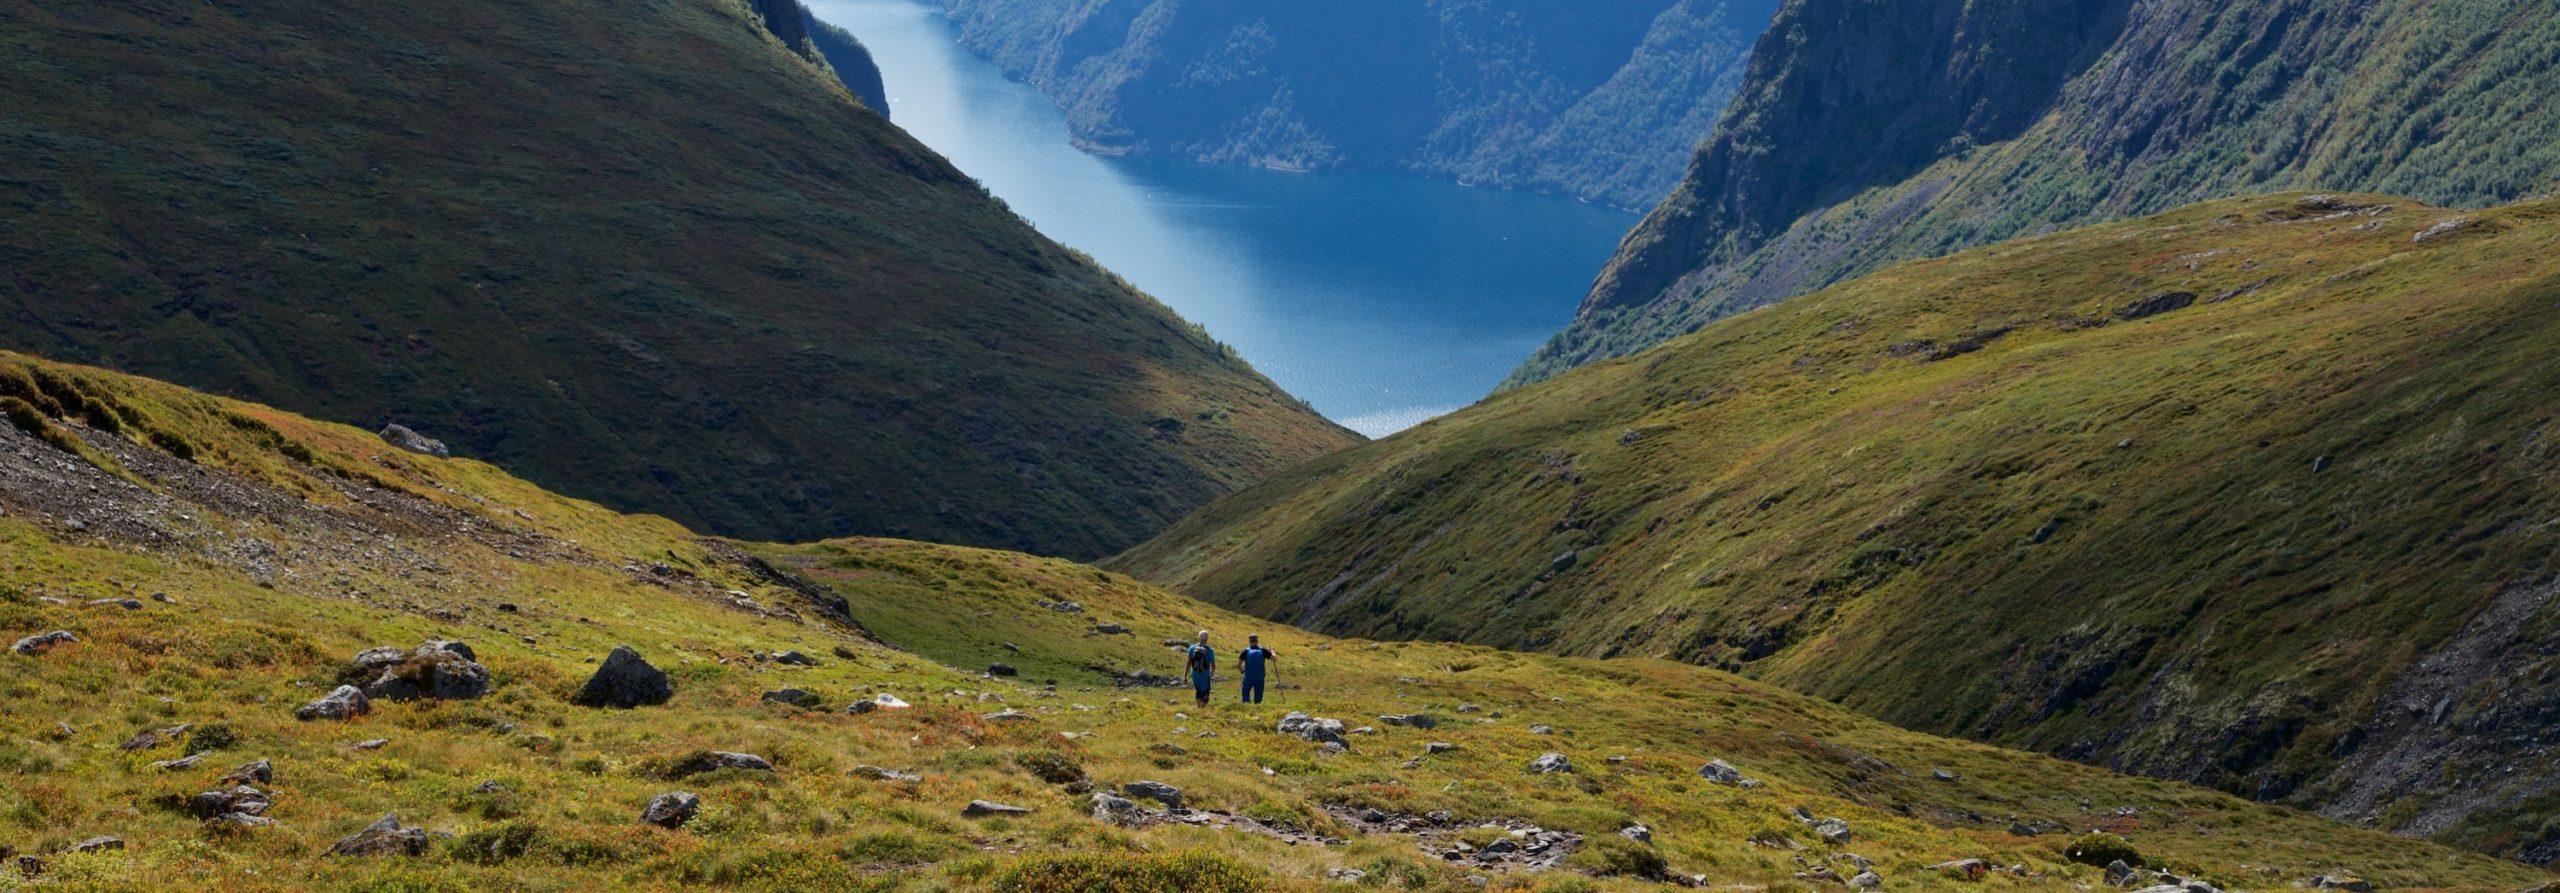 FJORDS NORWAY - Reis Sakte - Hiking towards Skjerdal and the Aurlandsfjord